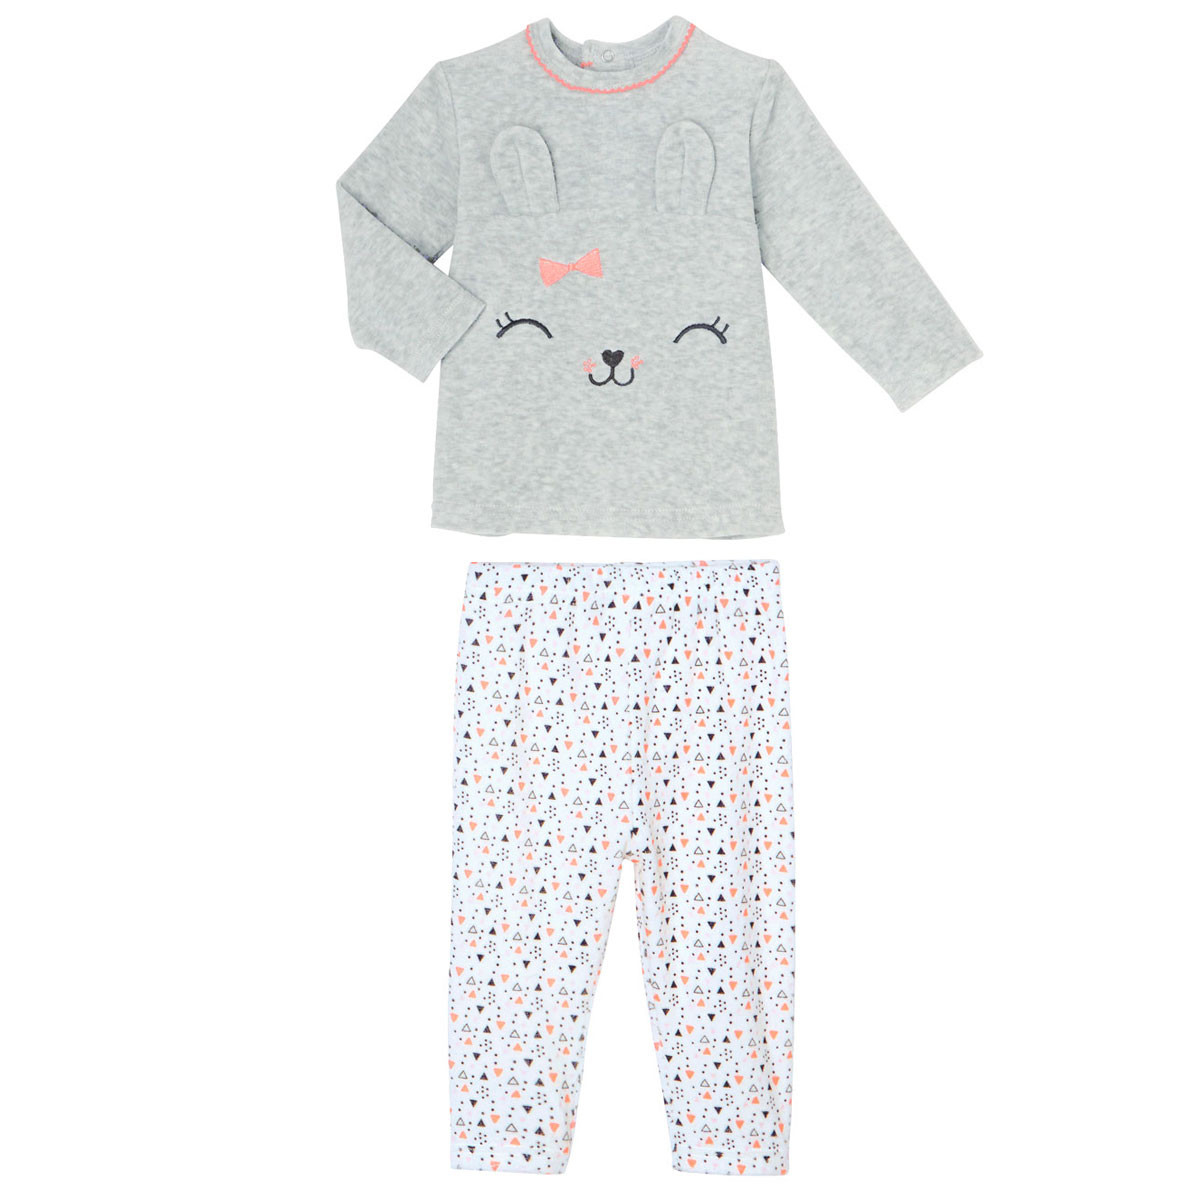 352b8ac101591 Pyjama bébé 2 pièces velours Pretty Bunny - PETIT BEGUIN